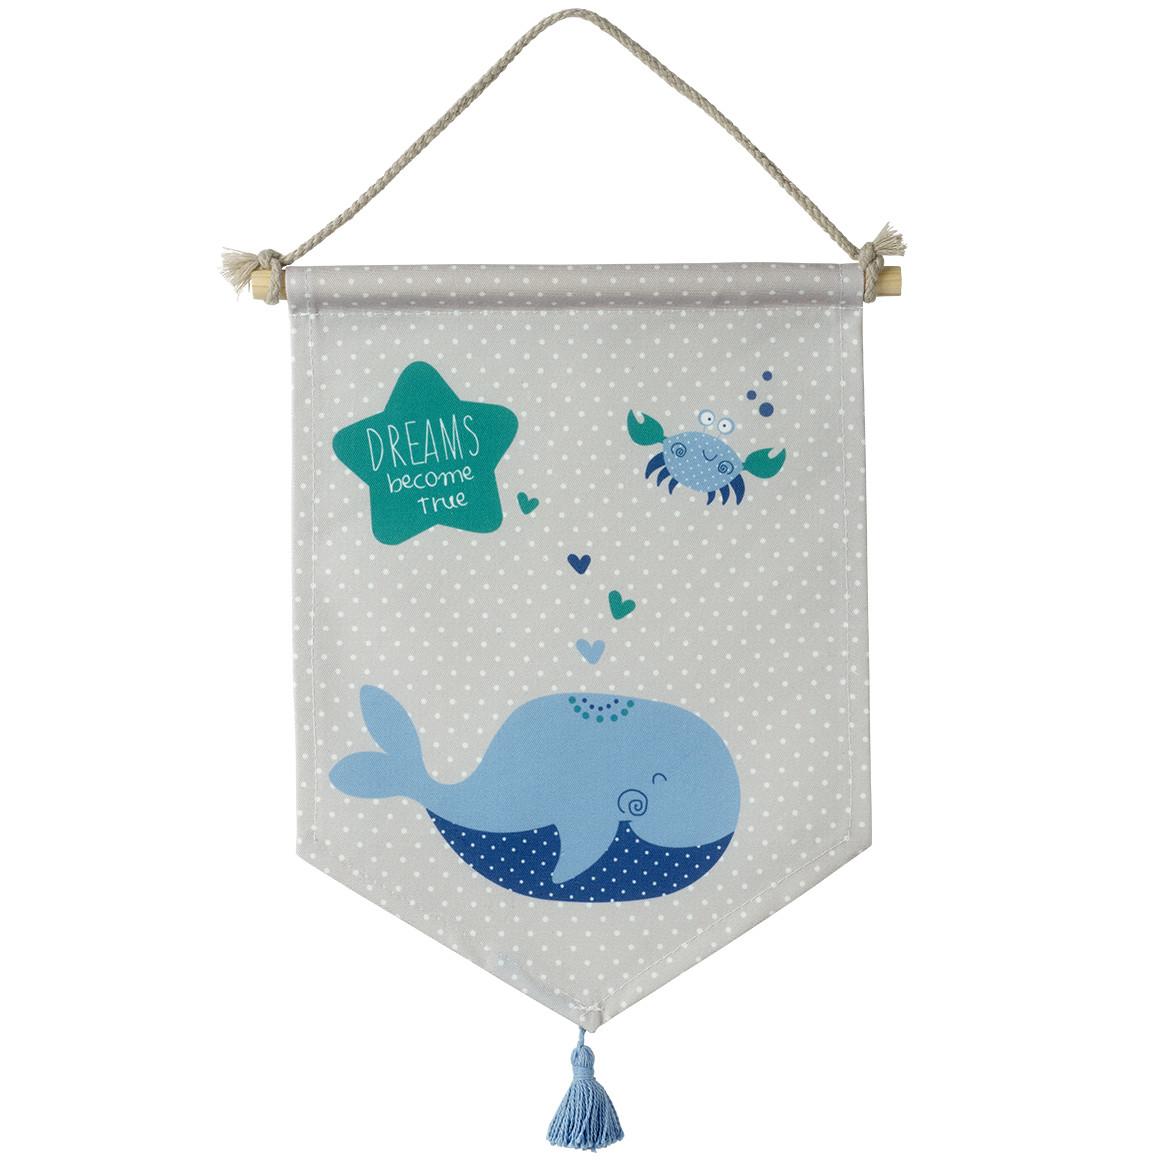 Wandhänger in grau mit blauem Waal